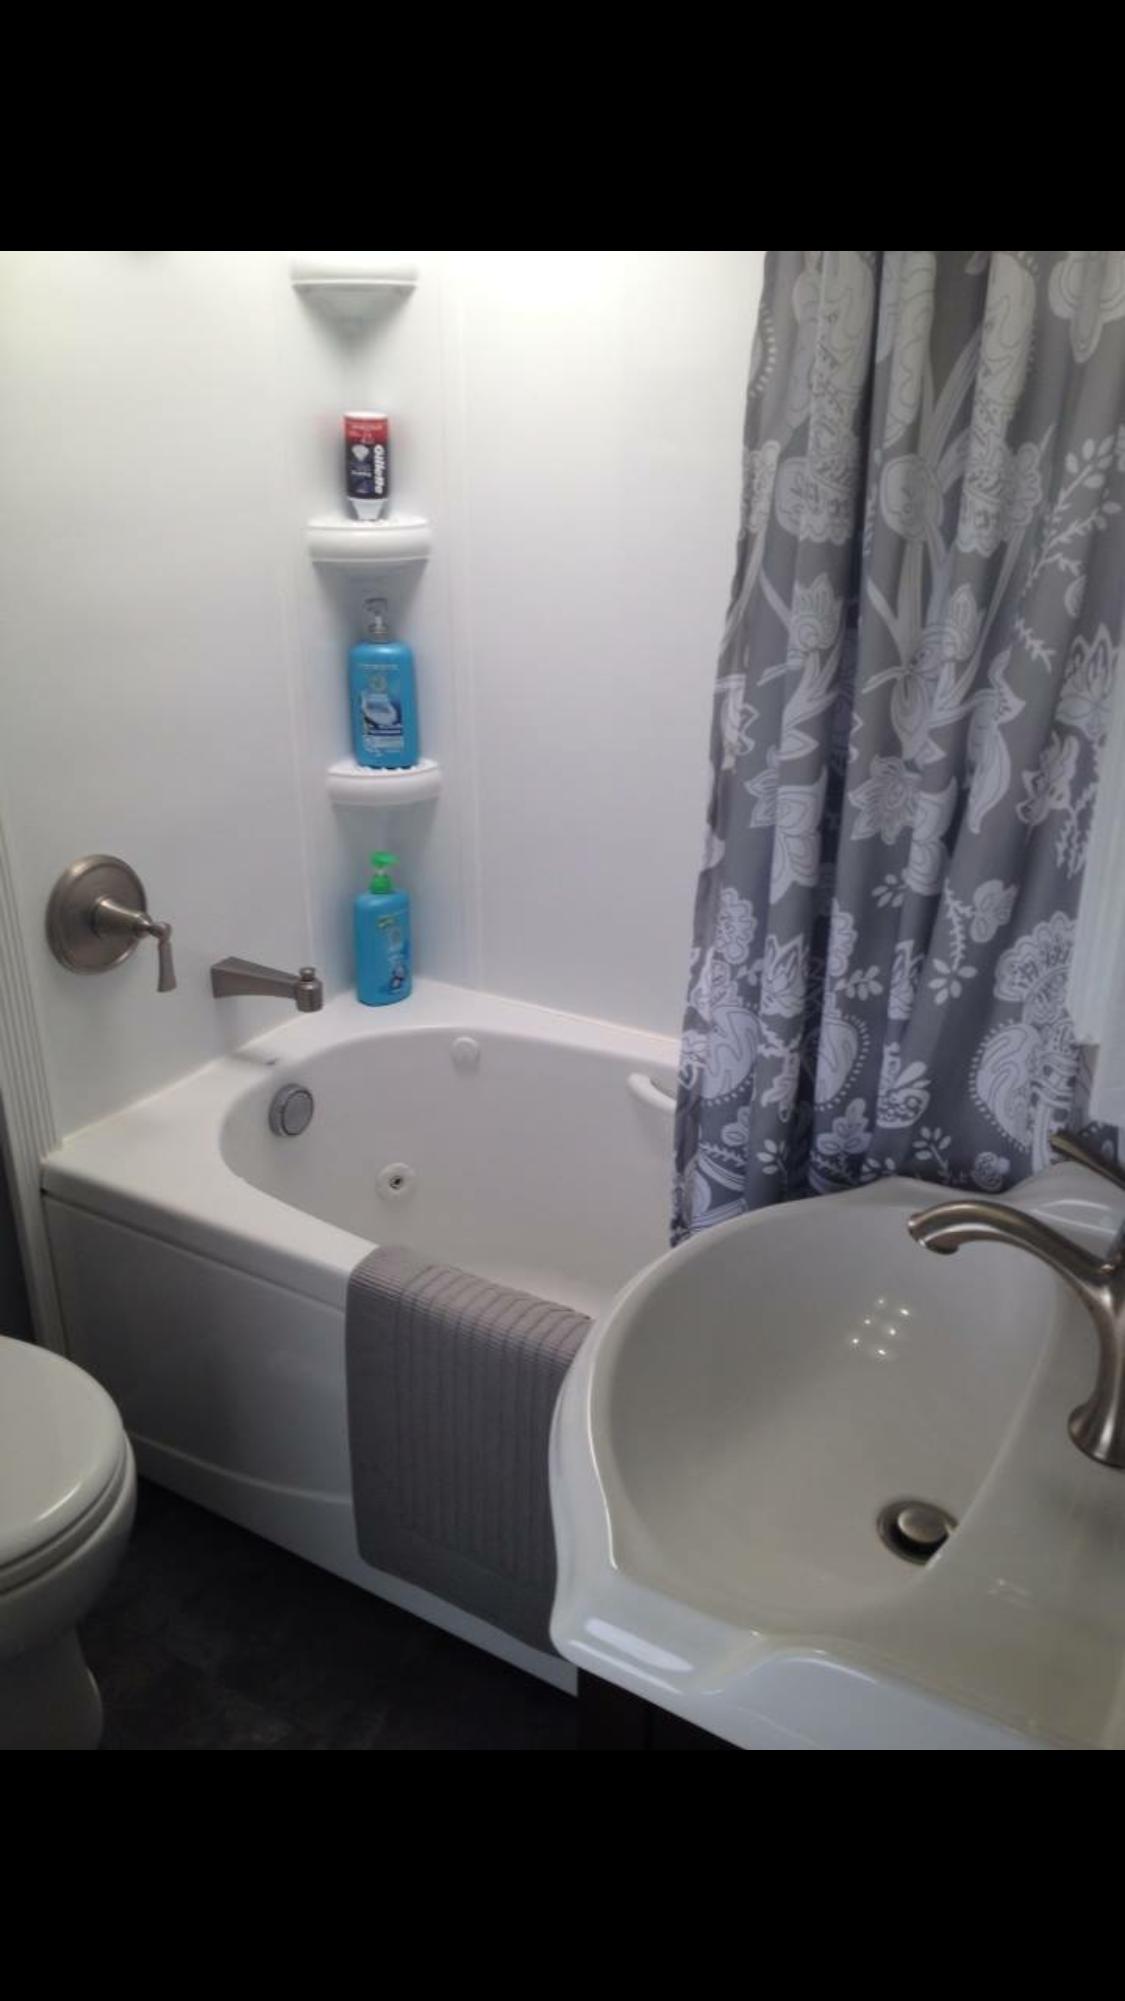 Fifth Wheel Bathroom Remodel With Whirlpool Tub